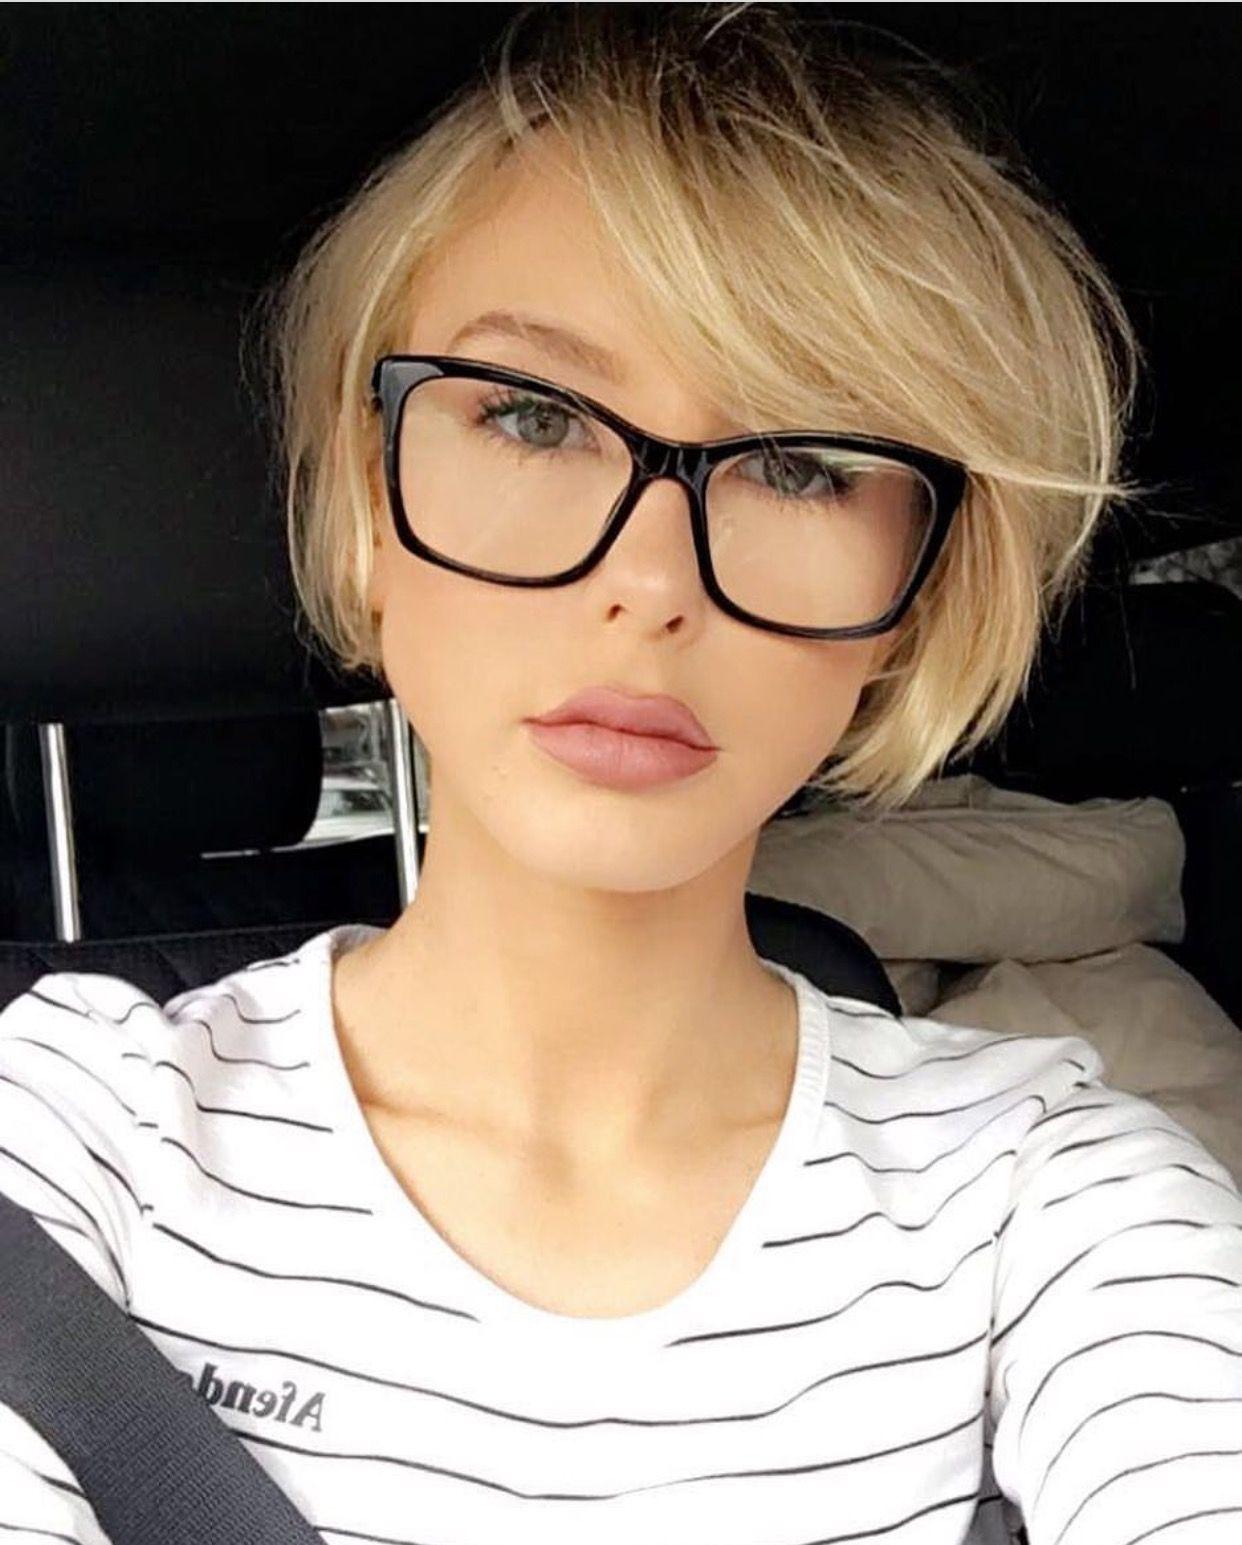 Blonde Bob On Adrianna Christina Insta Short Hair